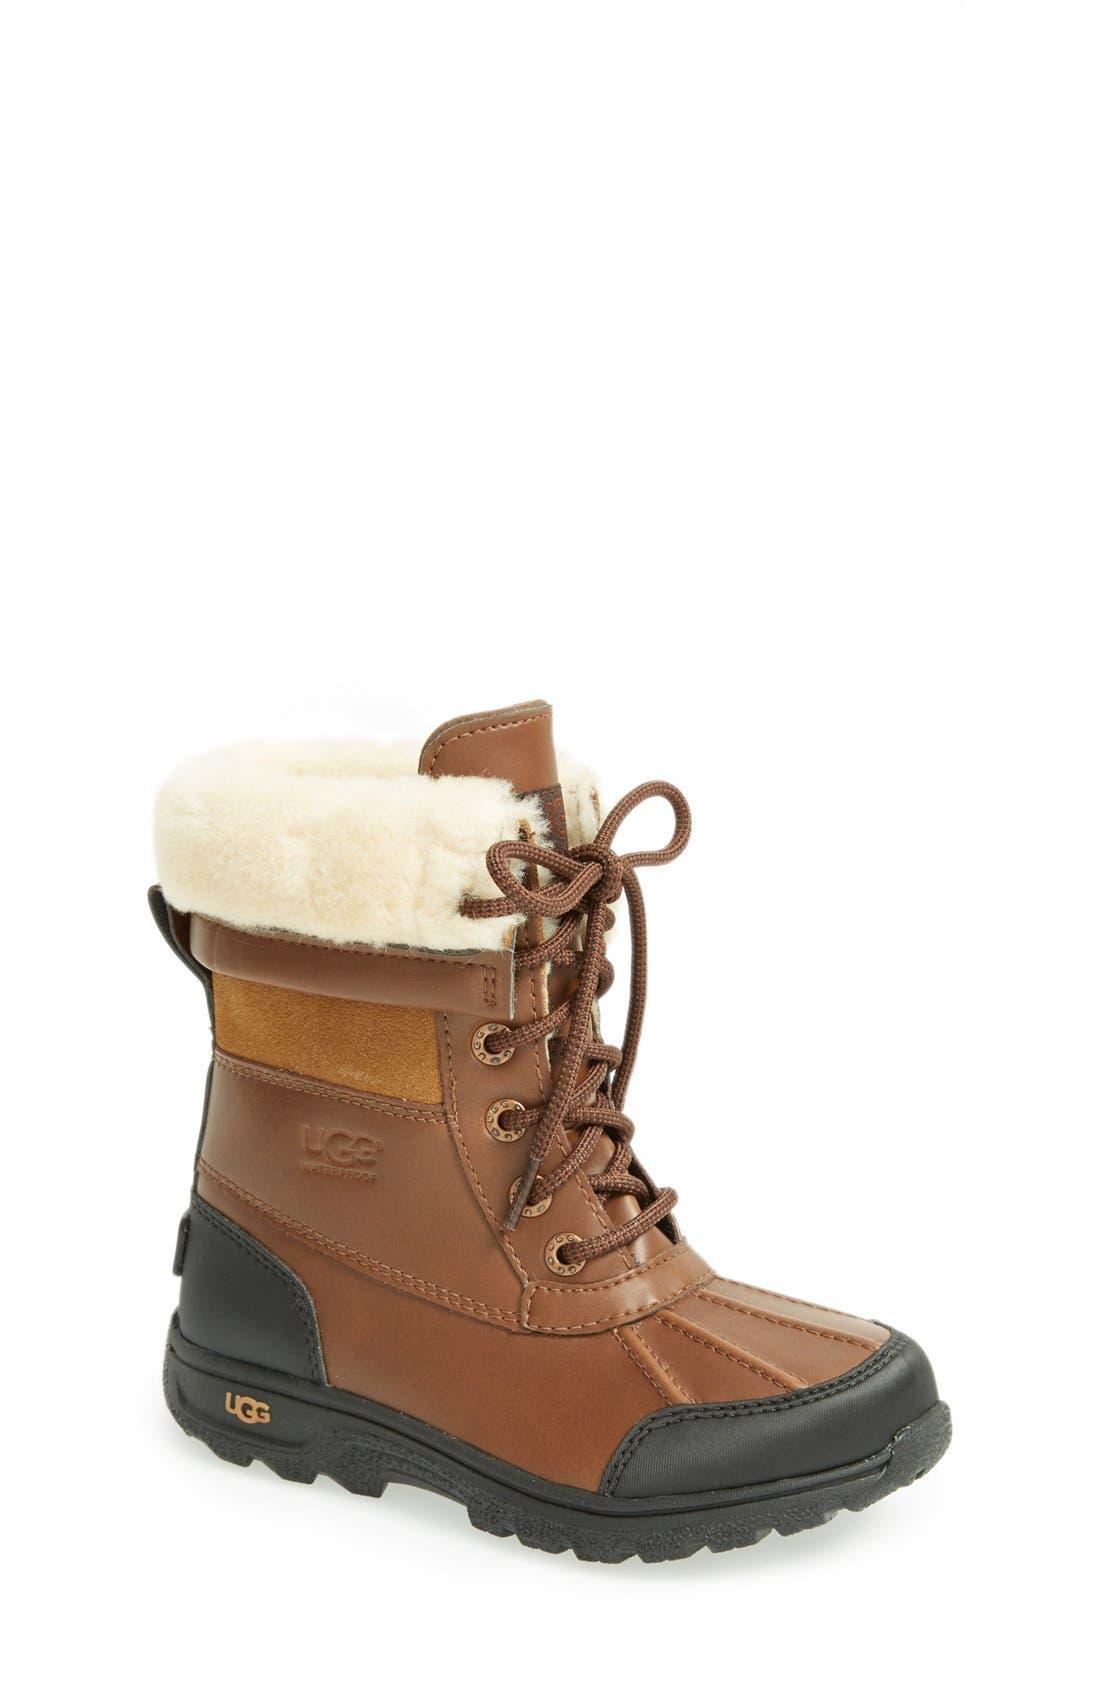 Alternate Image 1 Selected - UGG® 'Butte II' Waterproof Leather Boot (Little Kid & Big Kid)